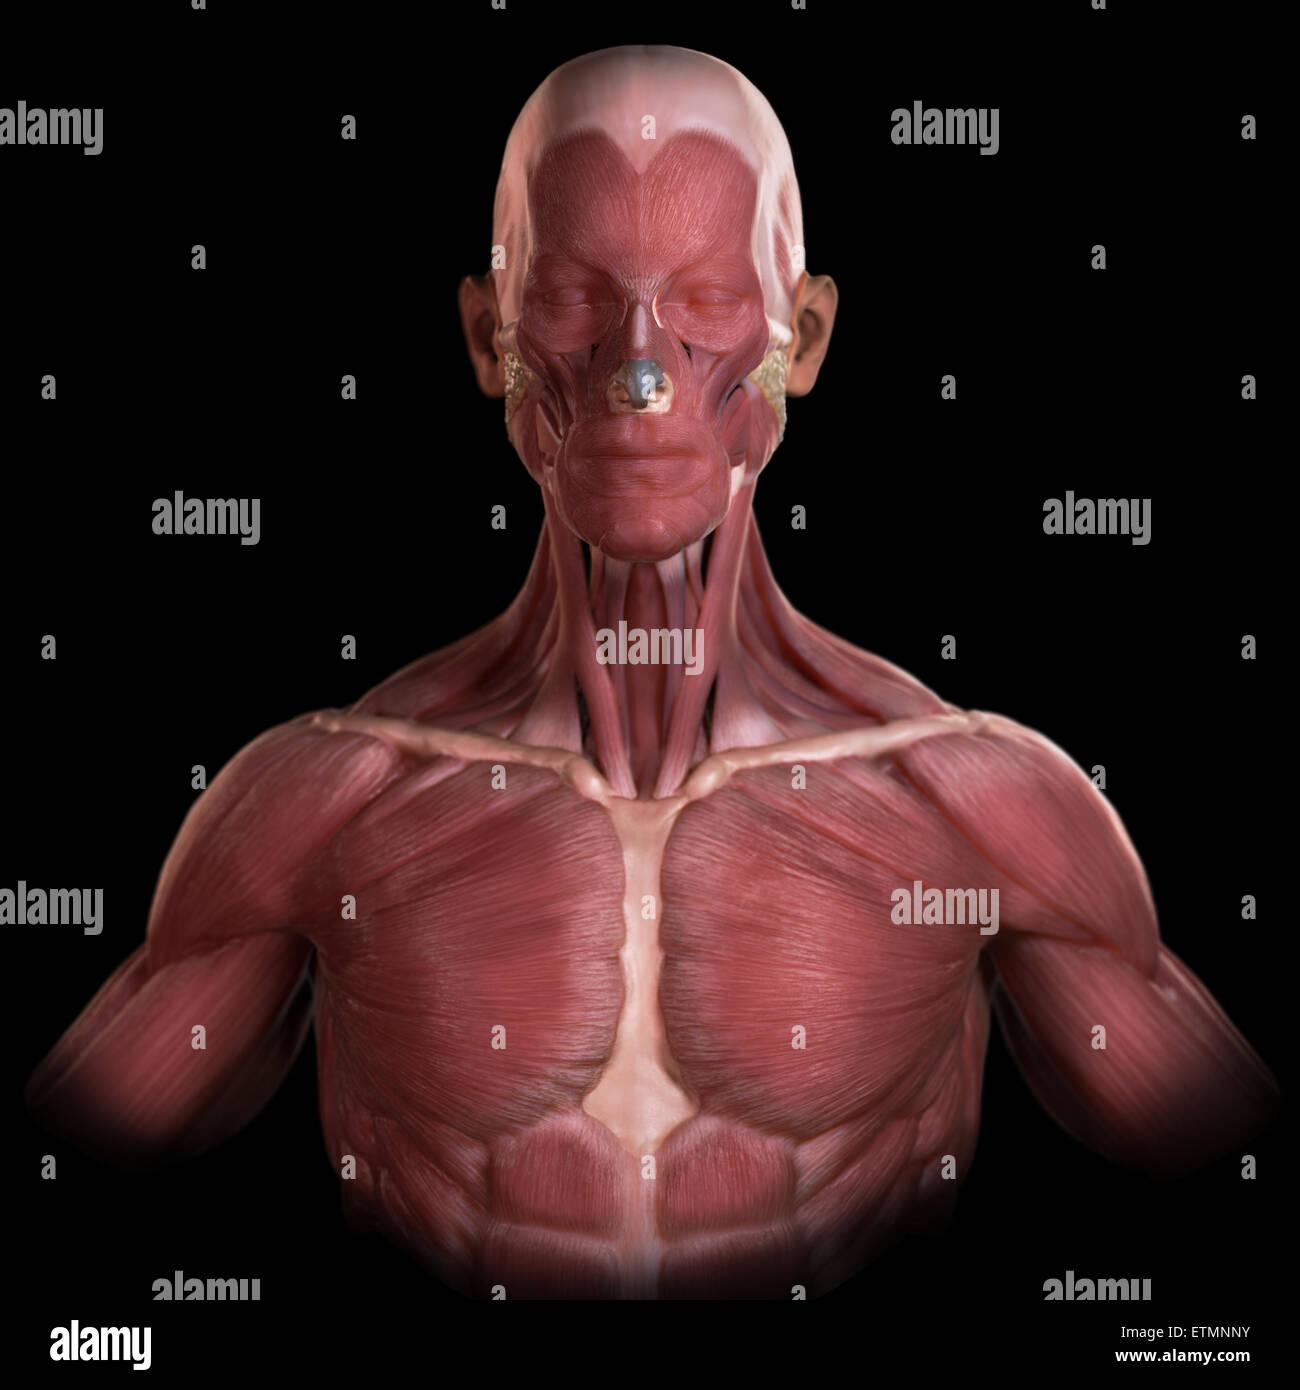 Human Upper Body Muscles Illustration Stock Photos Human Upper